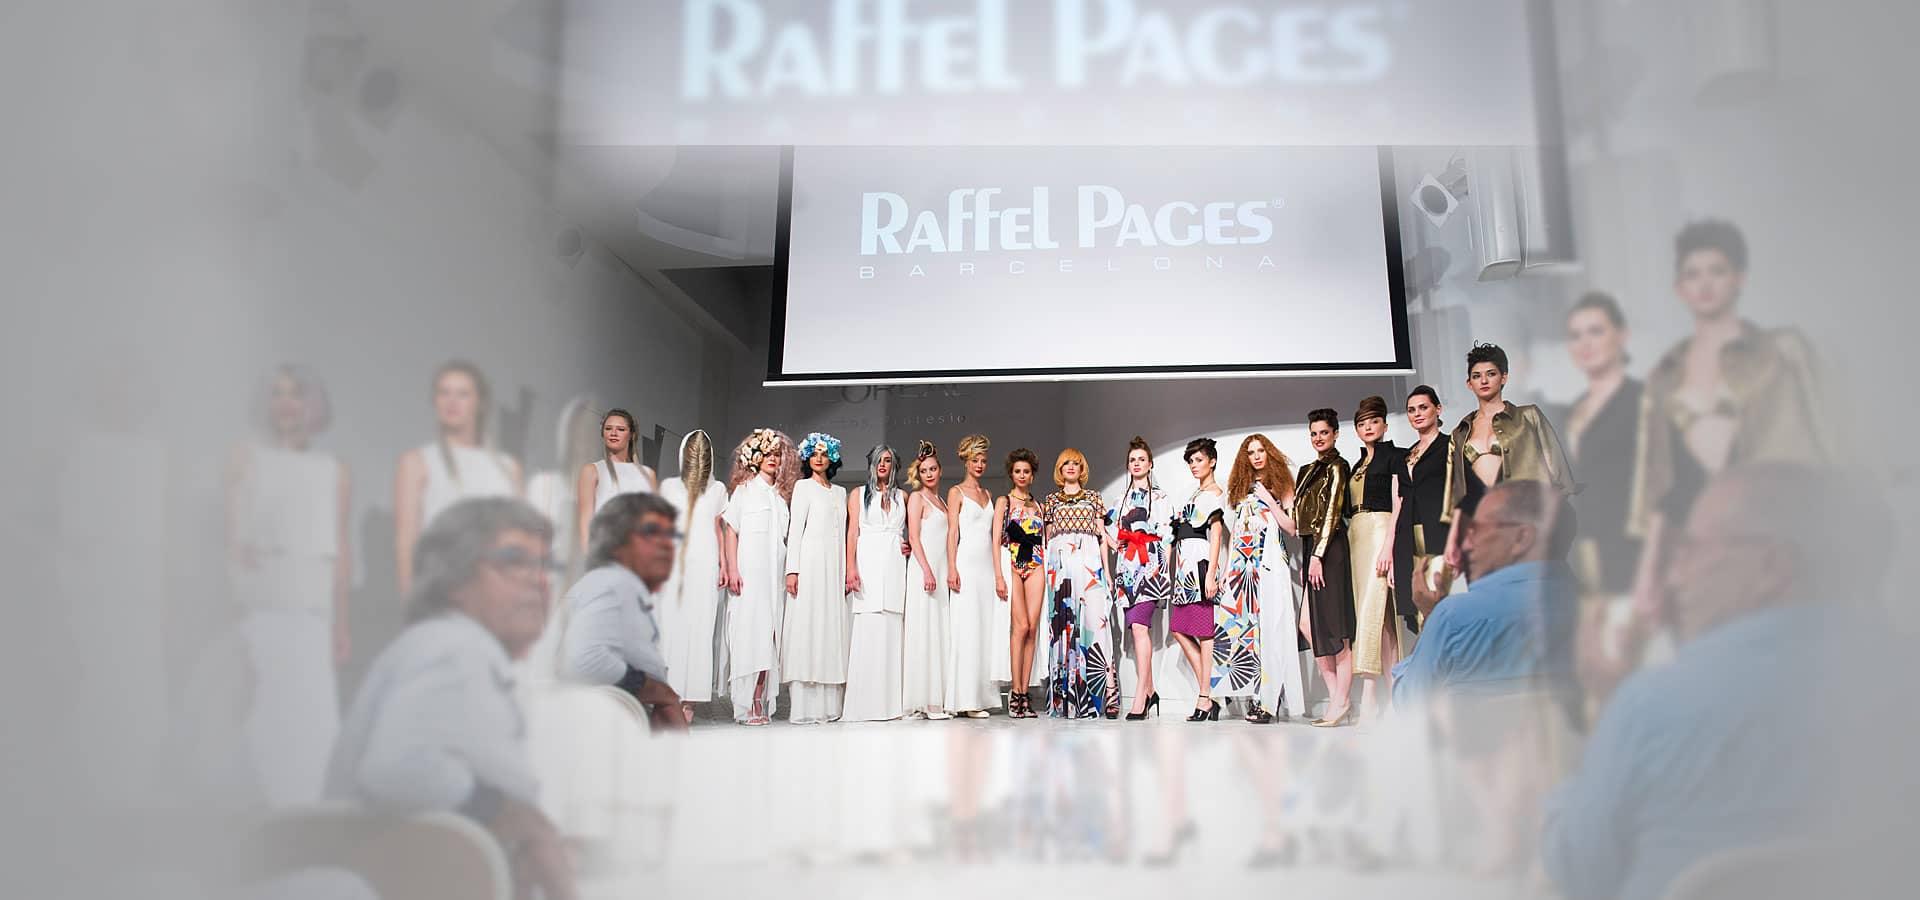 home-fondo-raffel-pages